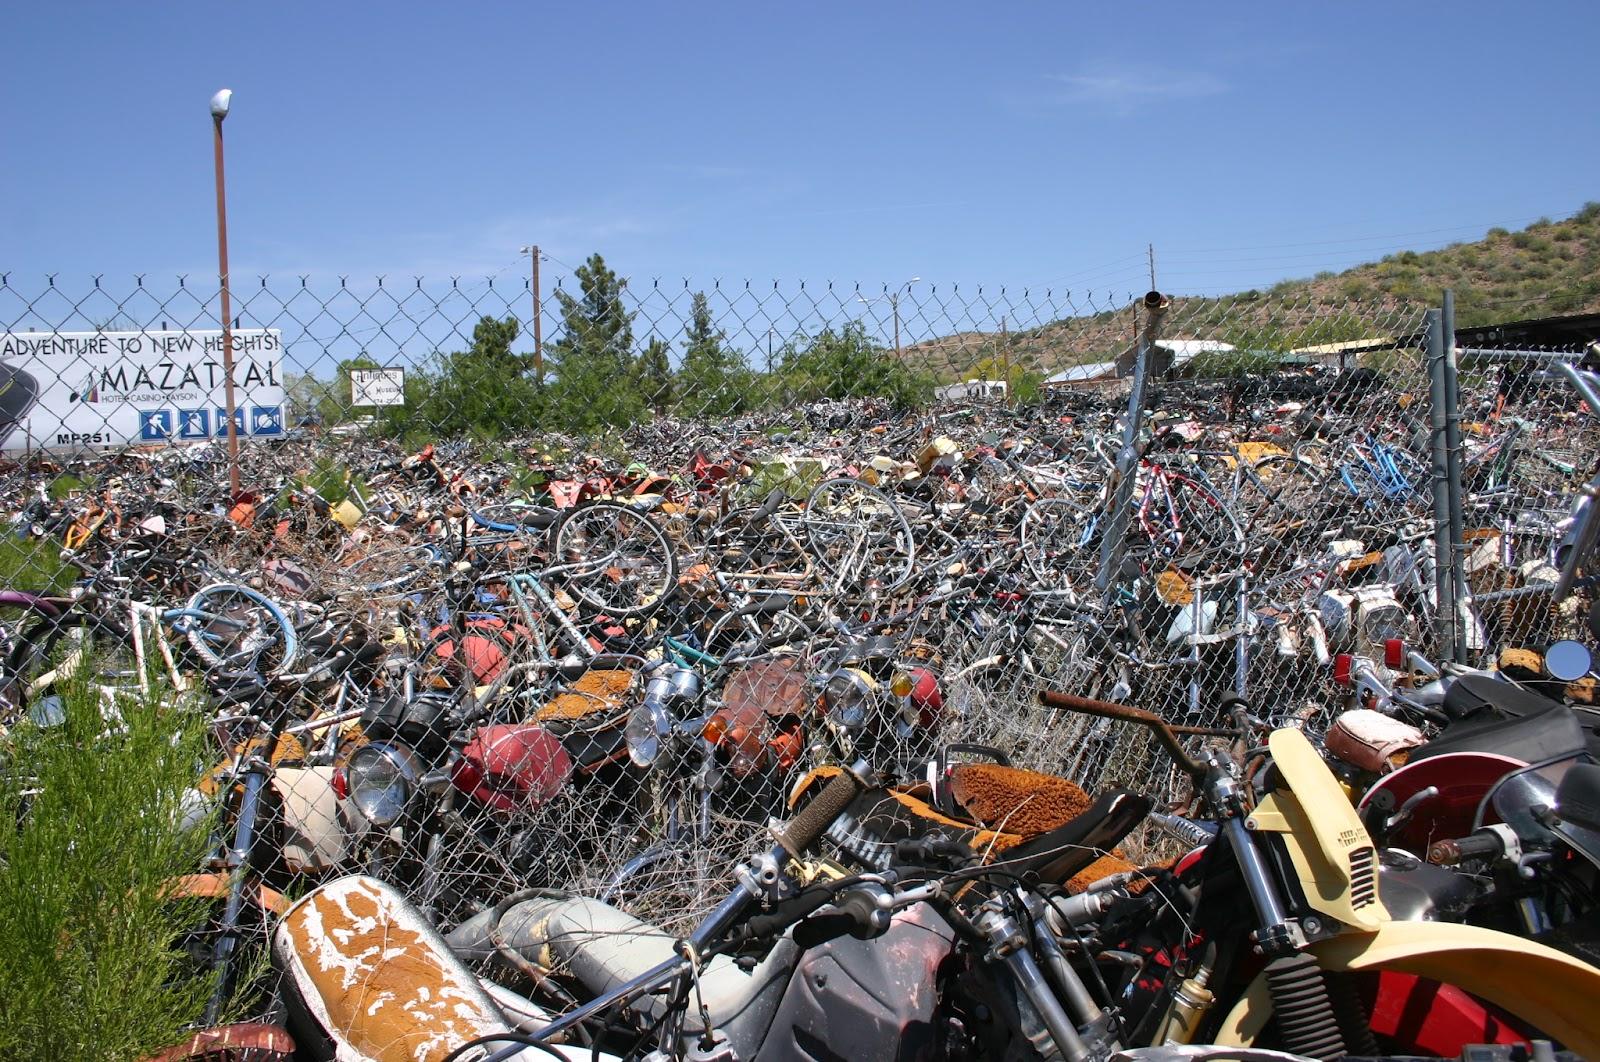 Phoenix Harley Davidson Dealers